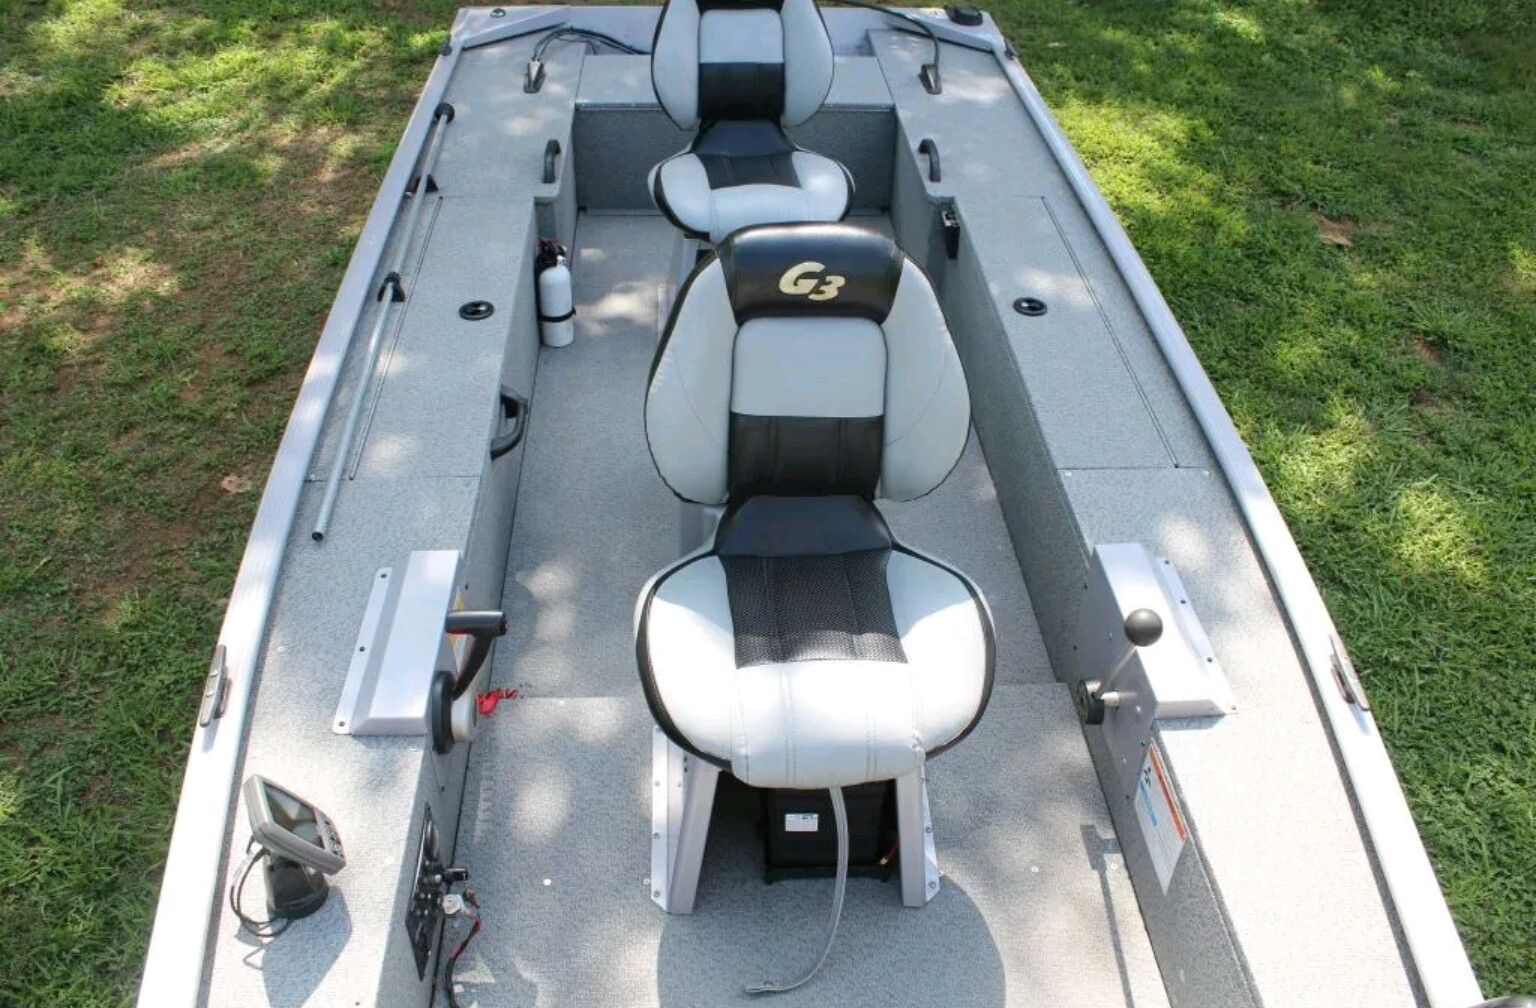 g3 pontoon boat wiring diagram pin on jon boats  pin on jon boats